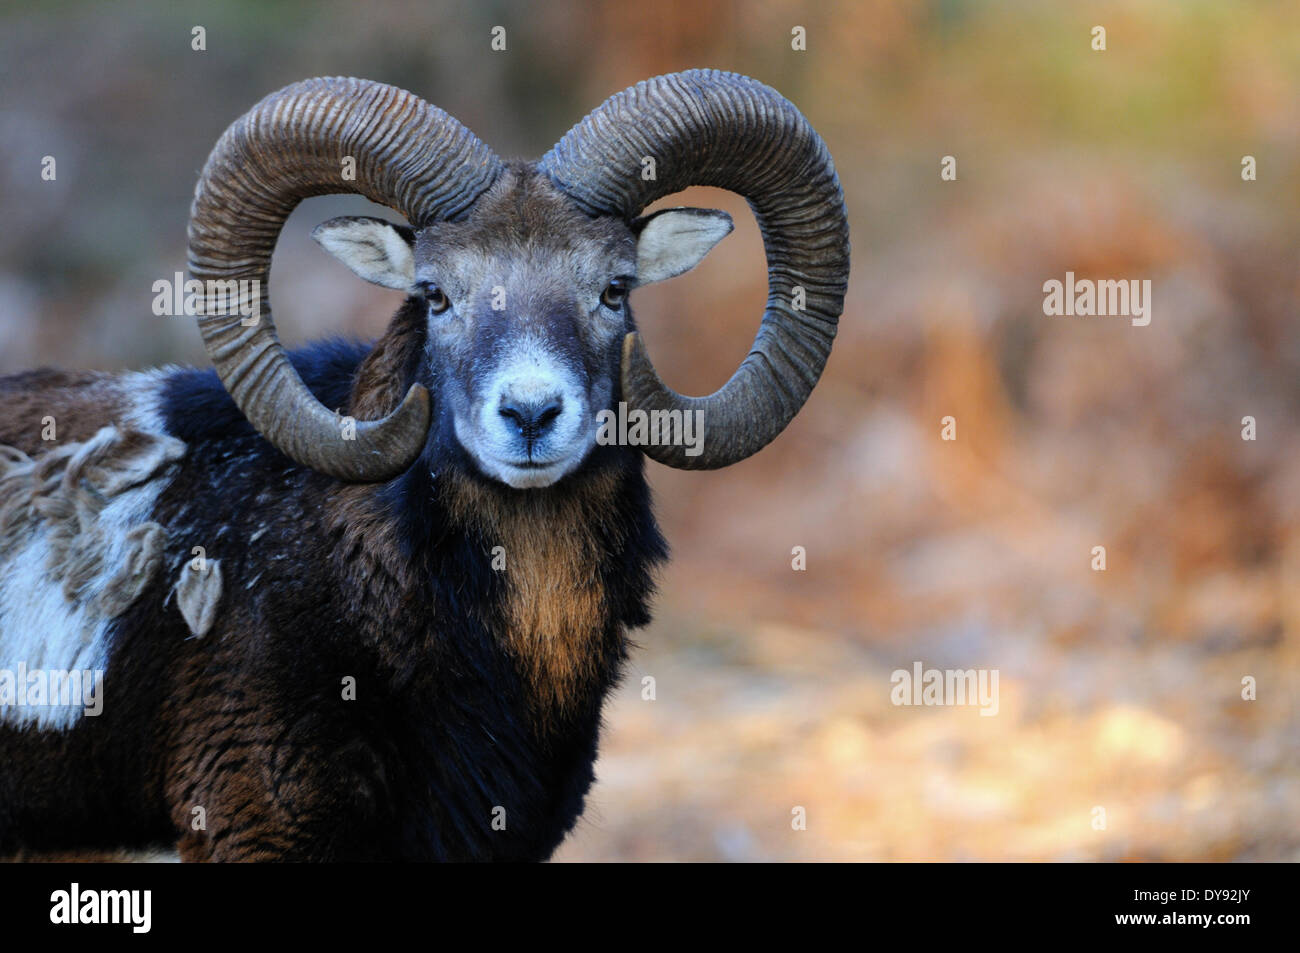 Mufflon ram mountain sheep Ovis ammon musimon winter coat sheep wild sheep goat-antelopes horn horns Mufflons animal - Stock Image